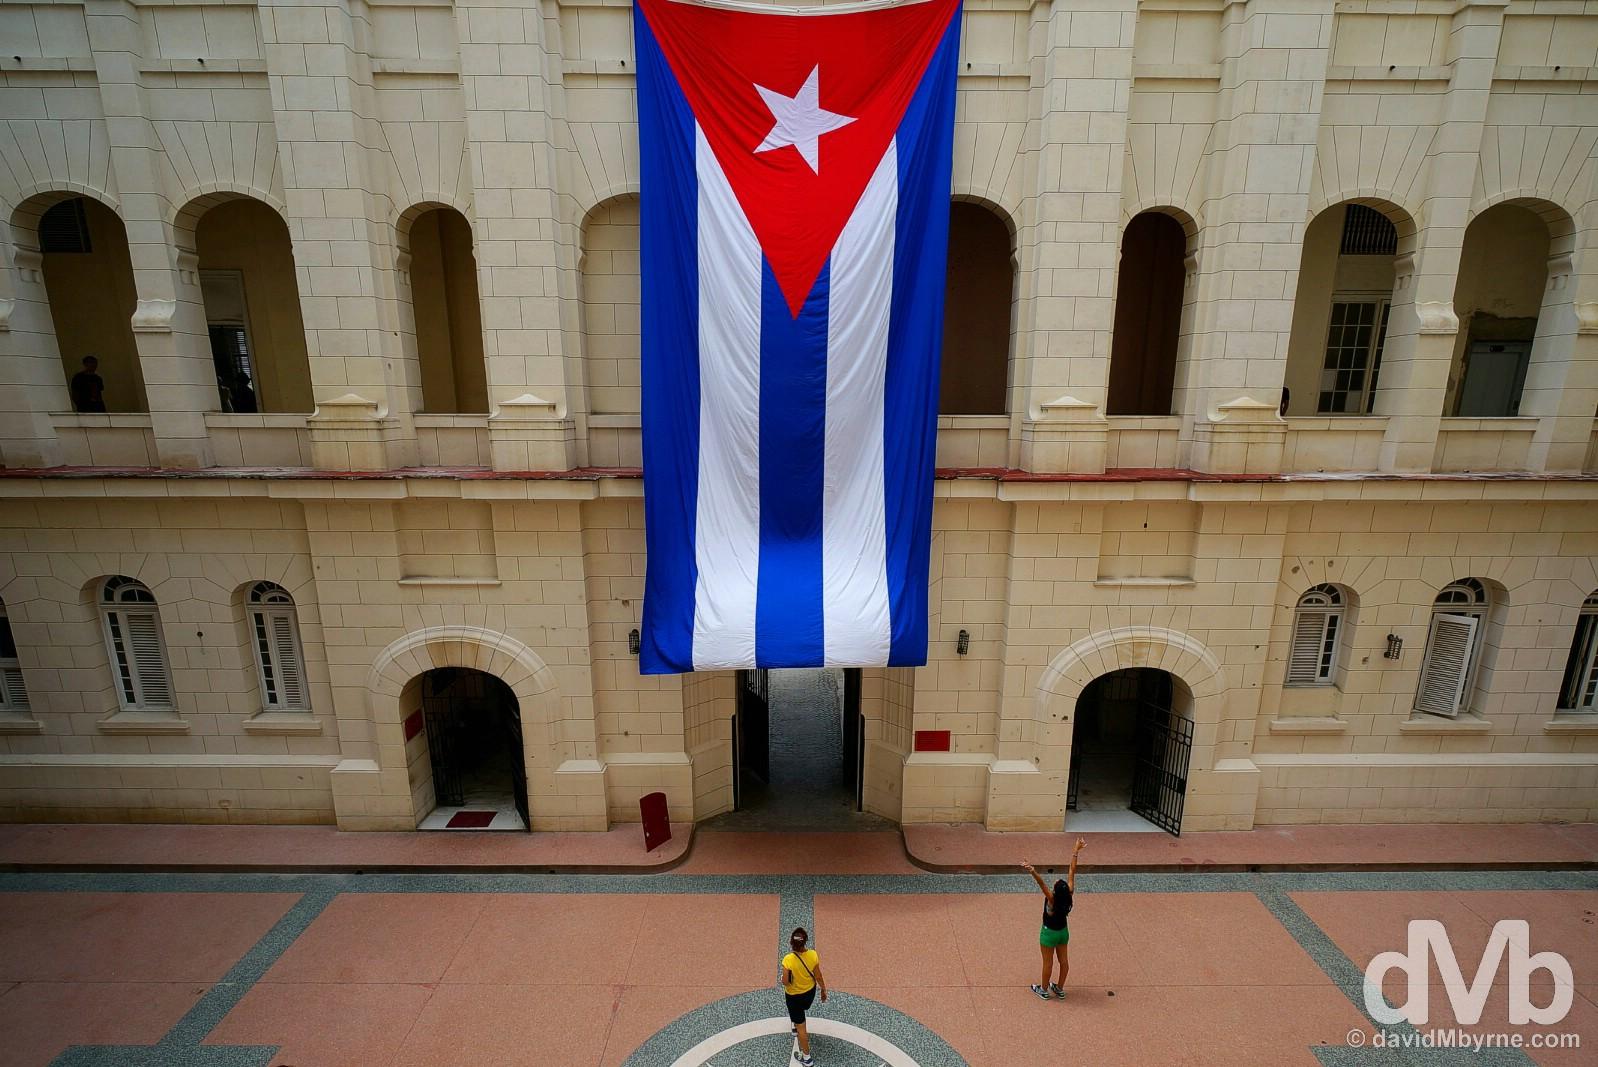 Museo de la Revolucion, The Museum of the Revolution, Havana, Cuba. May 2, 2015.